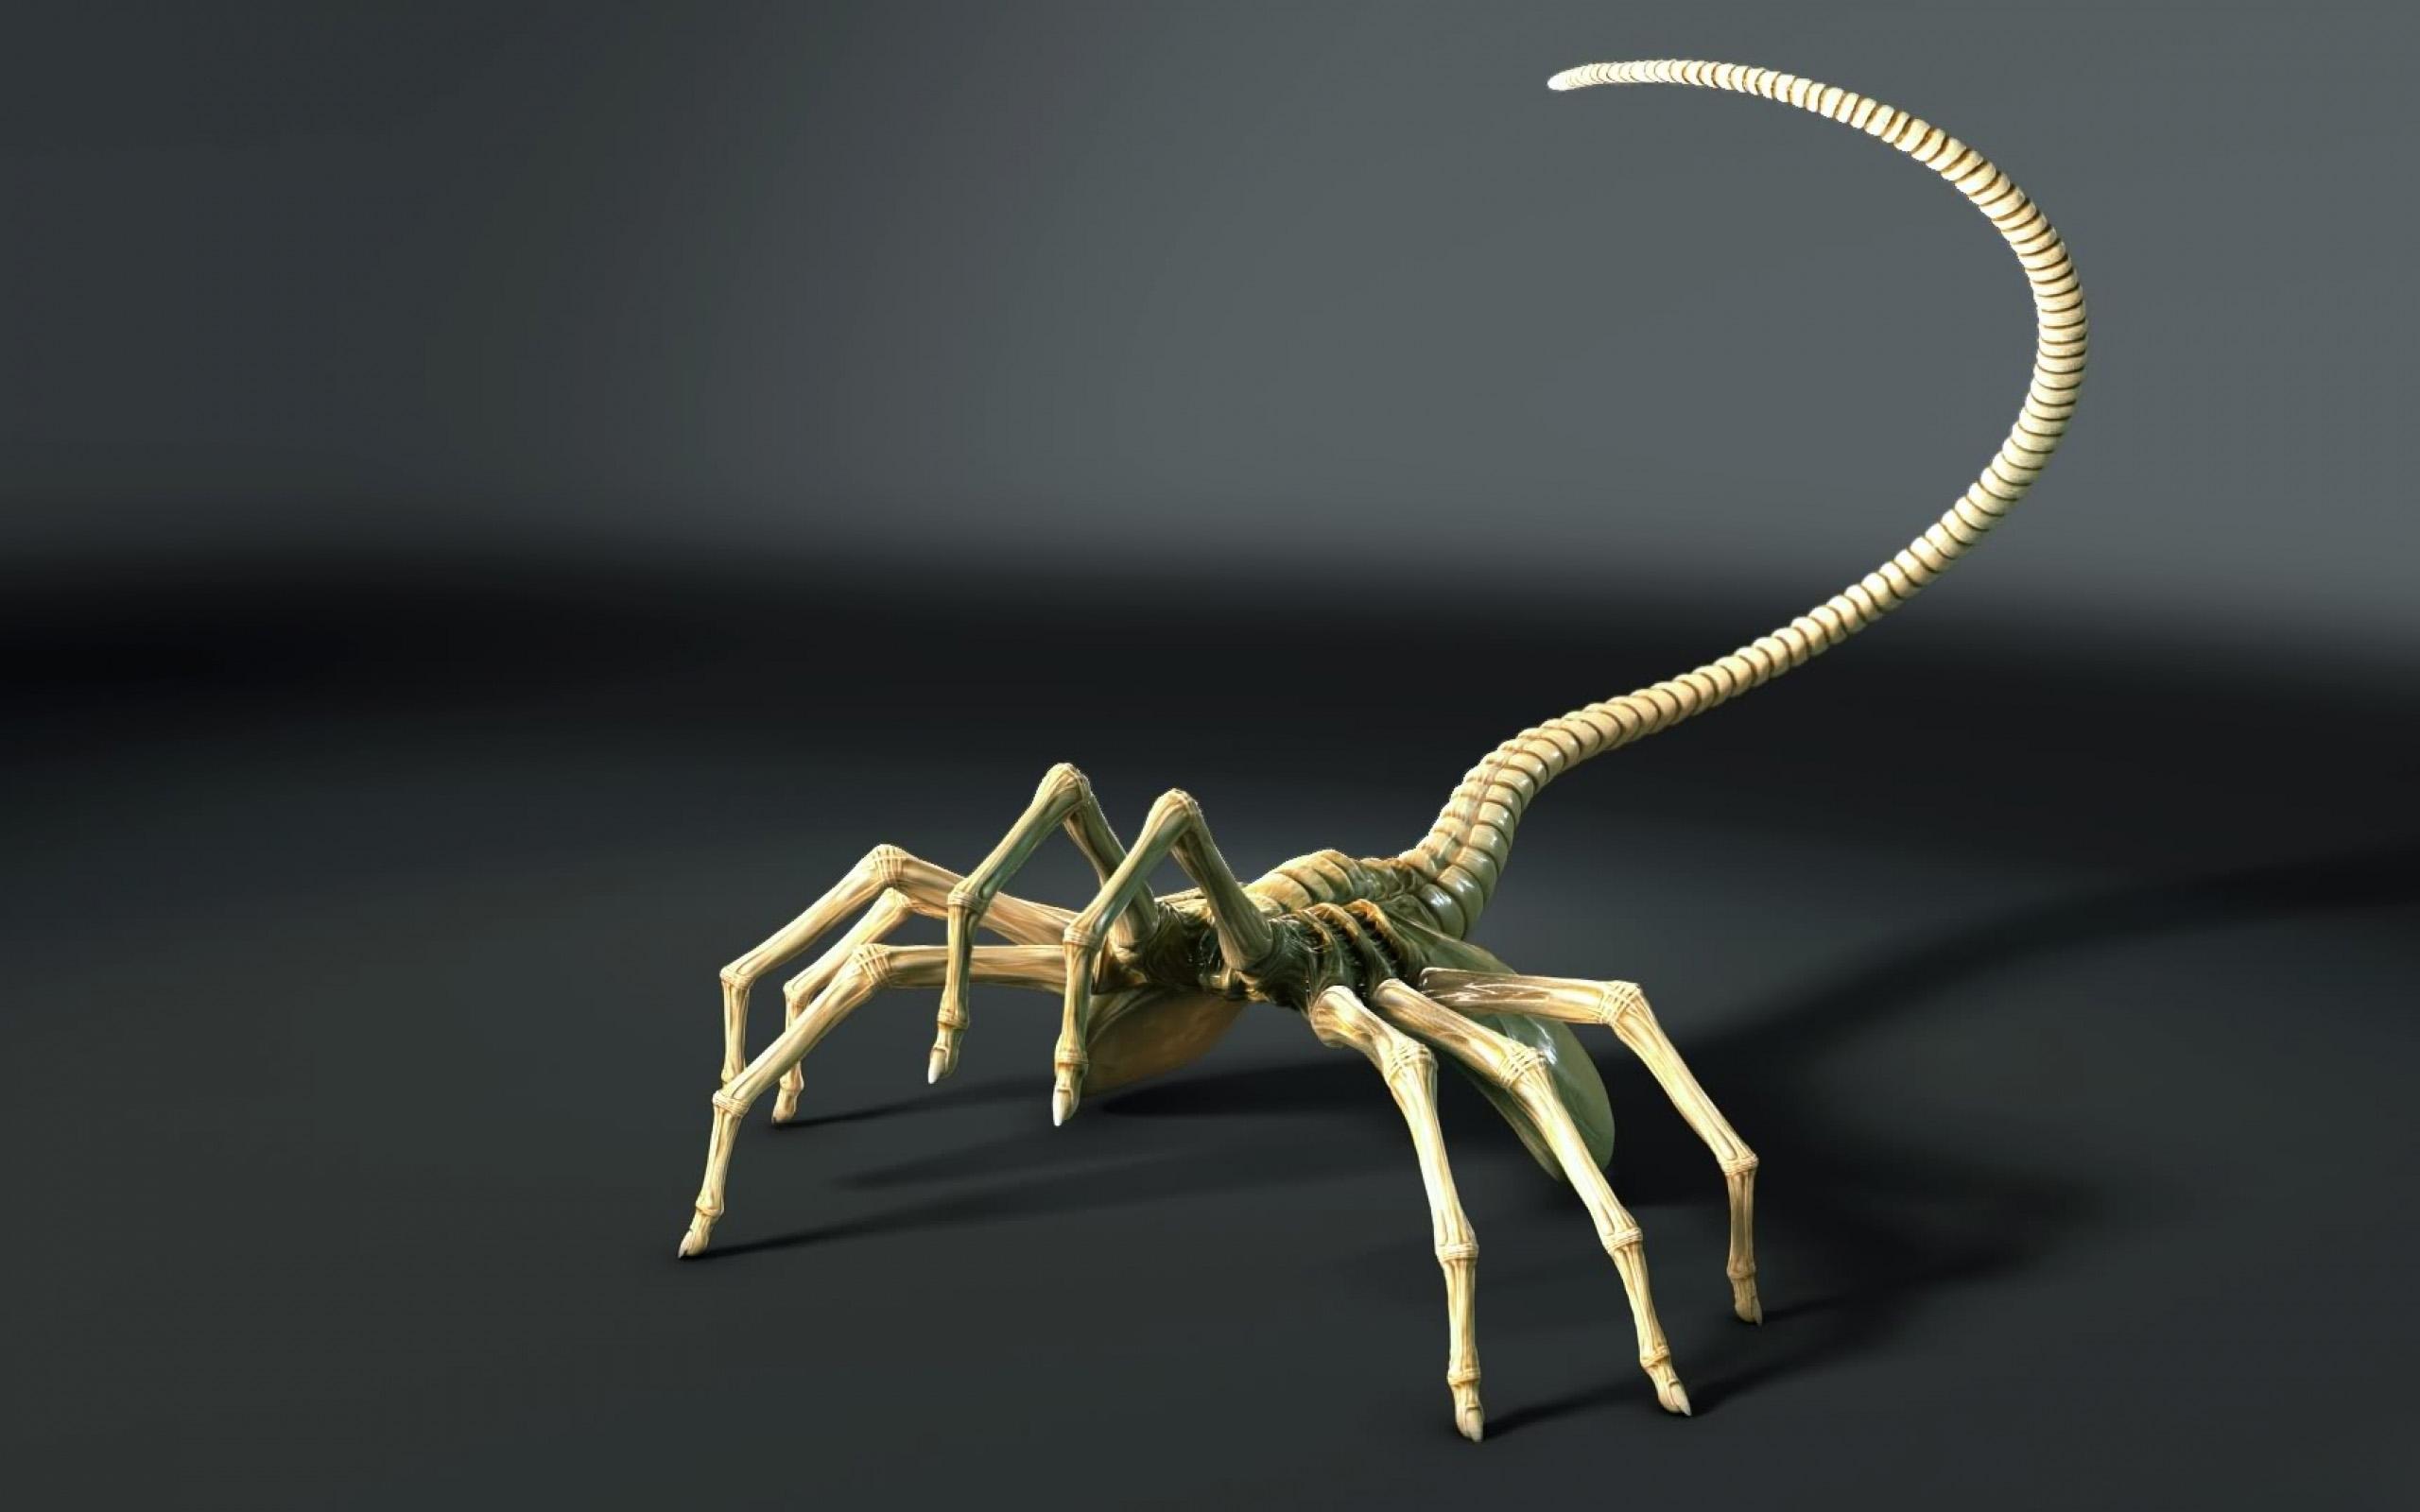 HD Scorpion Backgrounds 2560x1600